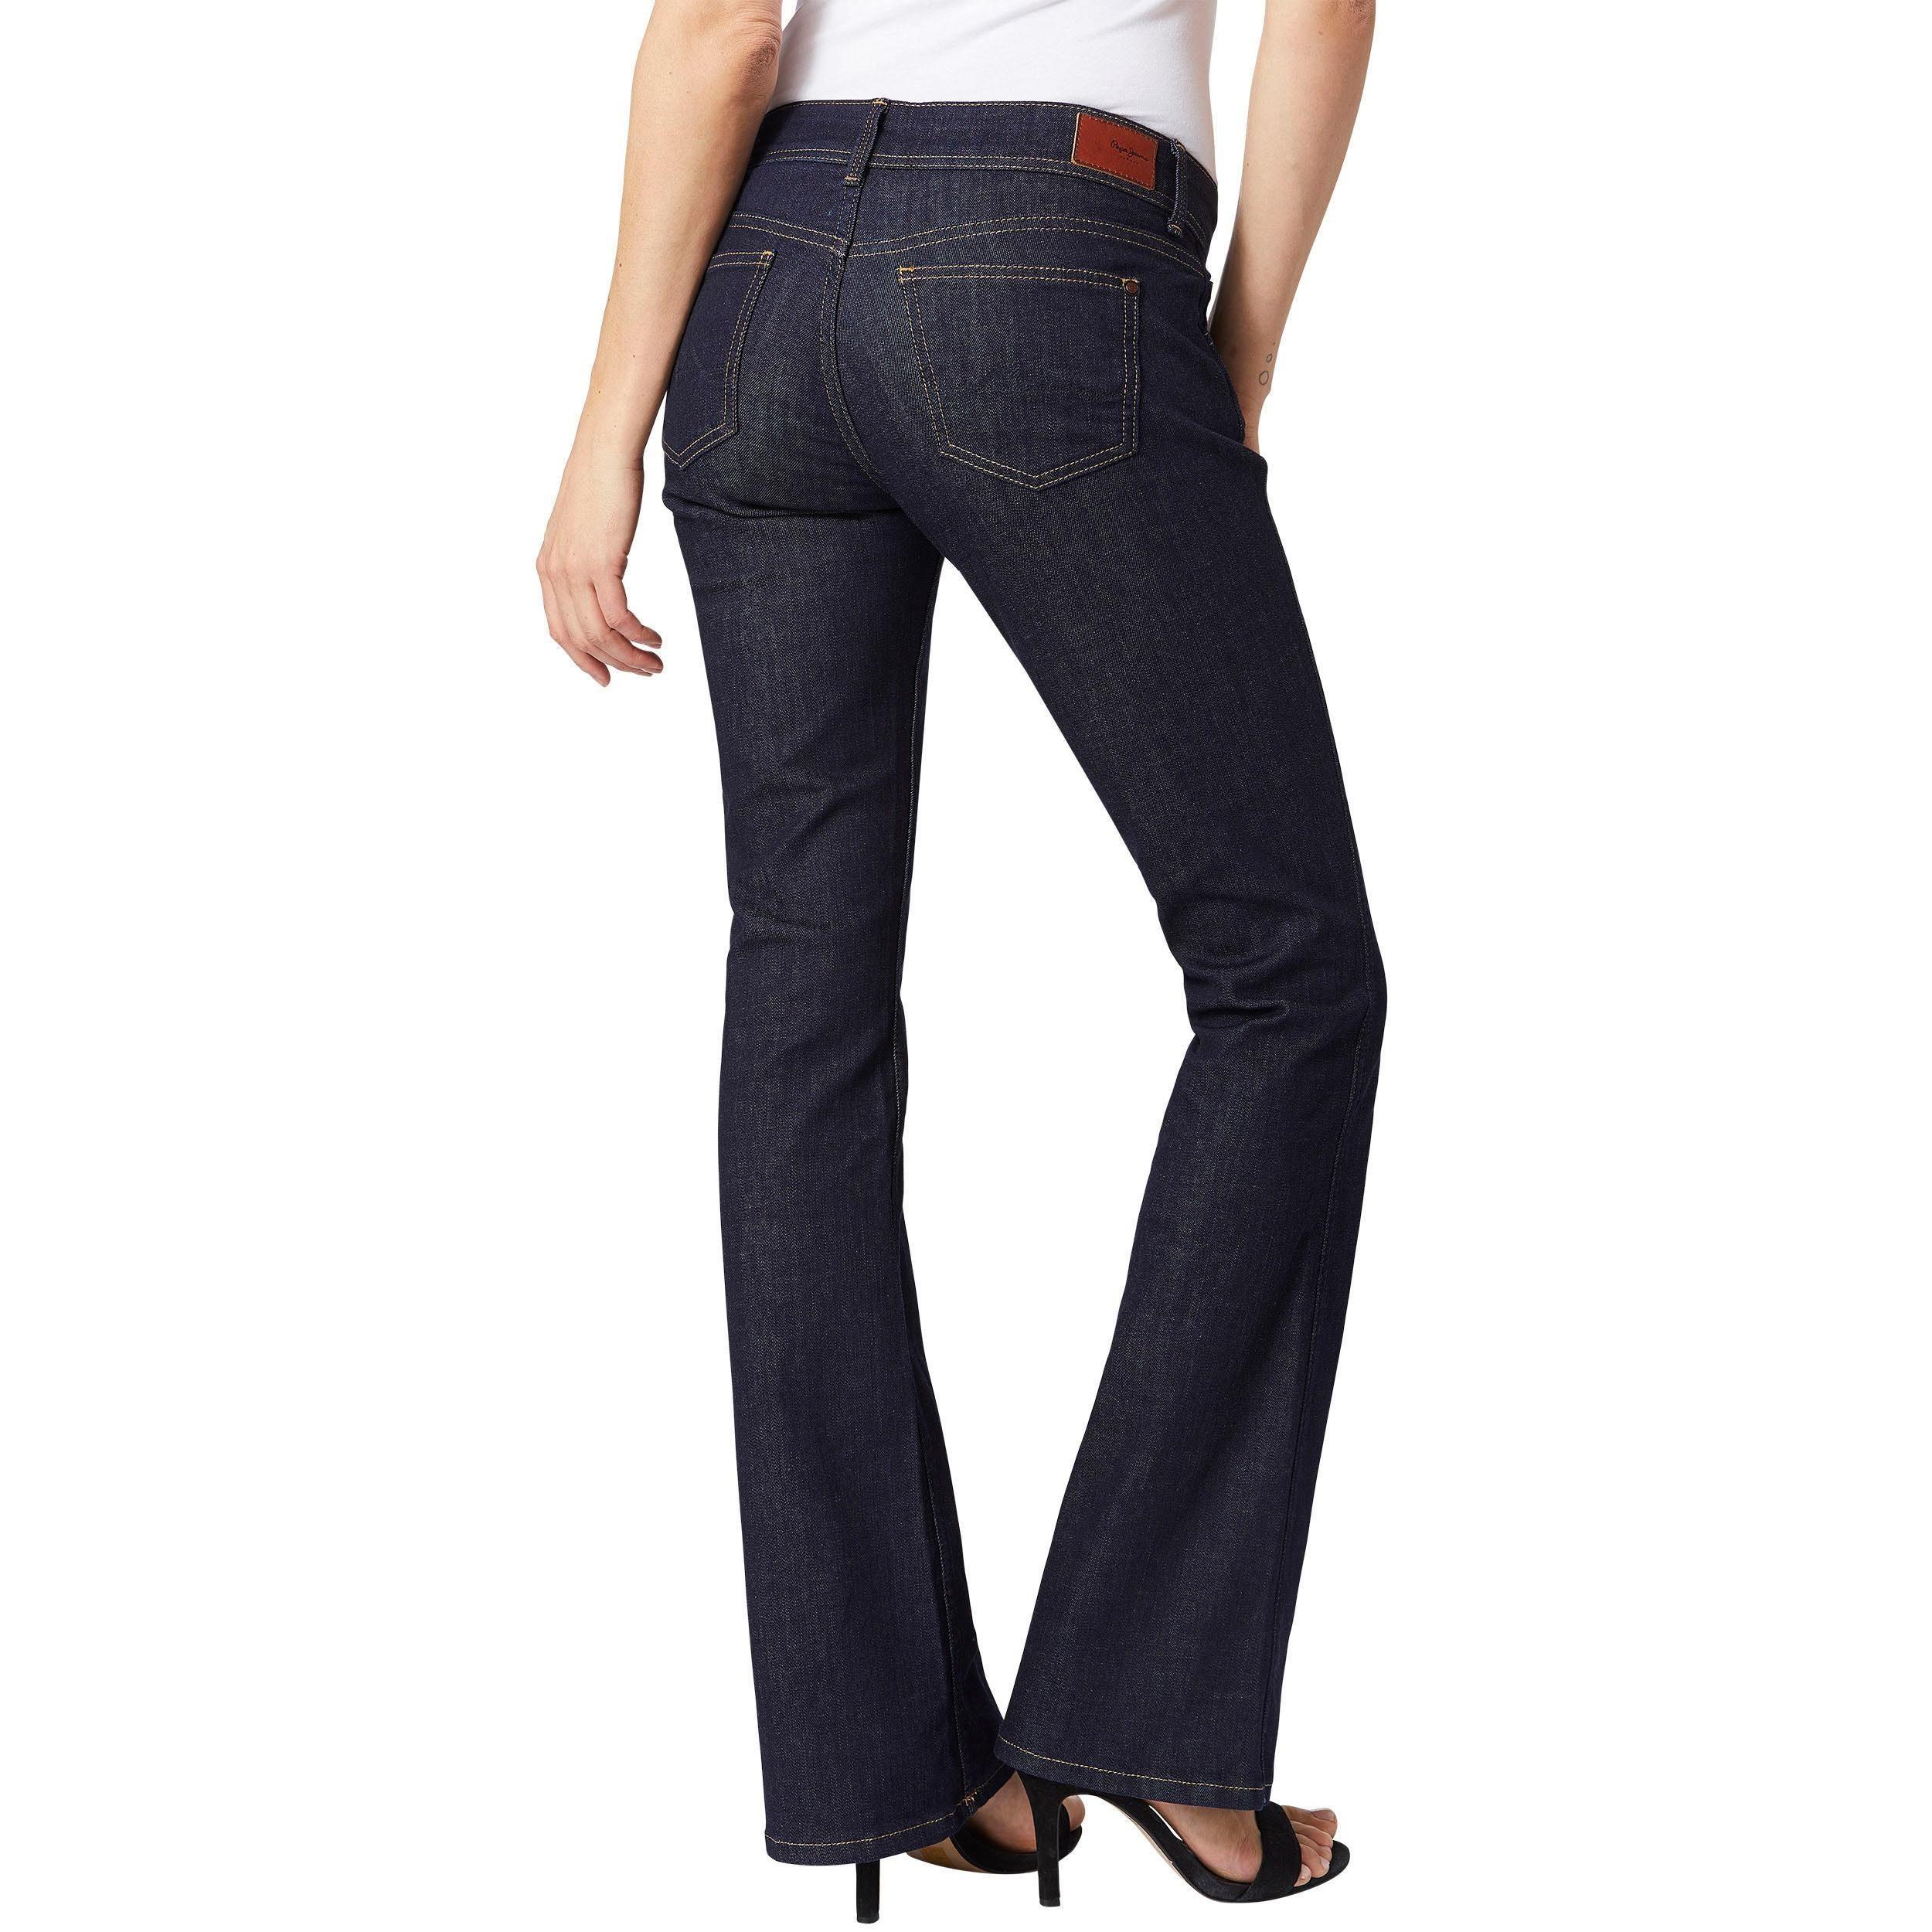 Pepe Jeans Schlagjeans NEW PIMLICO | Bekleidung > Jeans > Bootcut-Jeans & Schlagjeans | Pepe Jeans